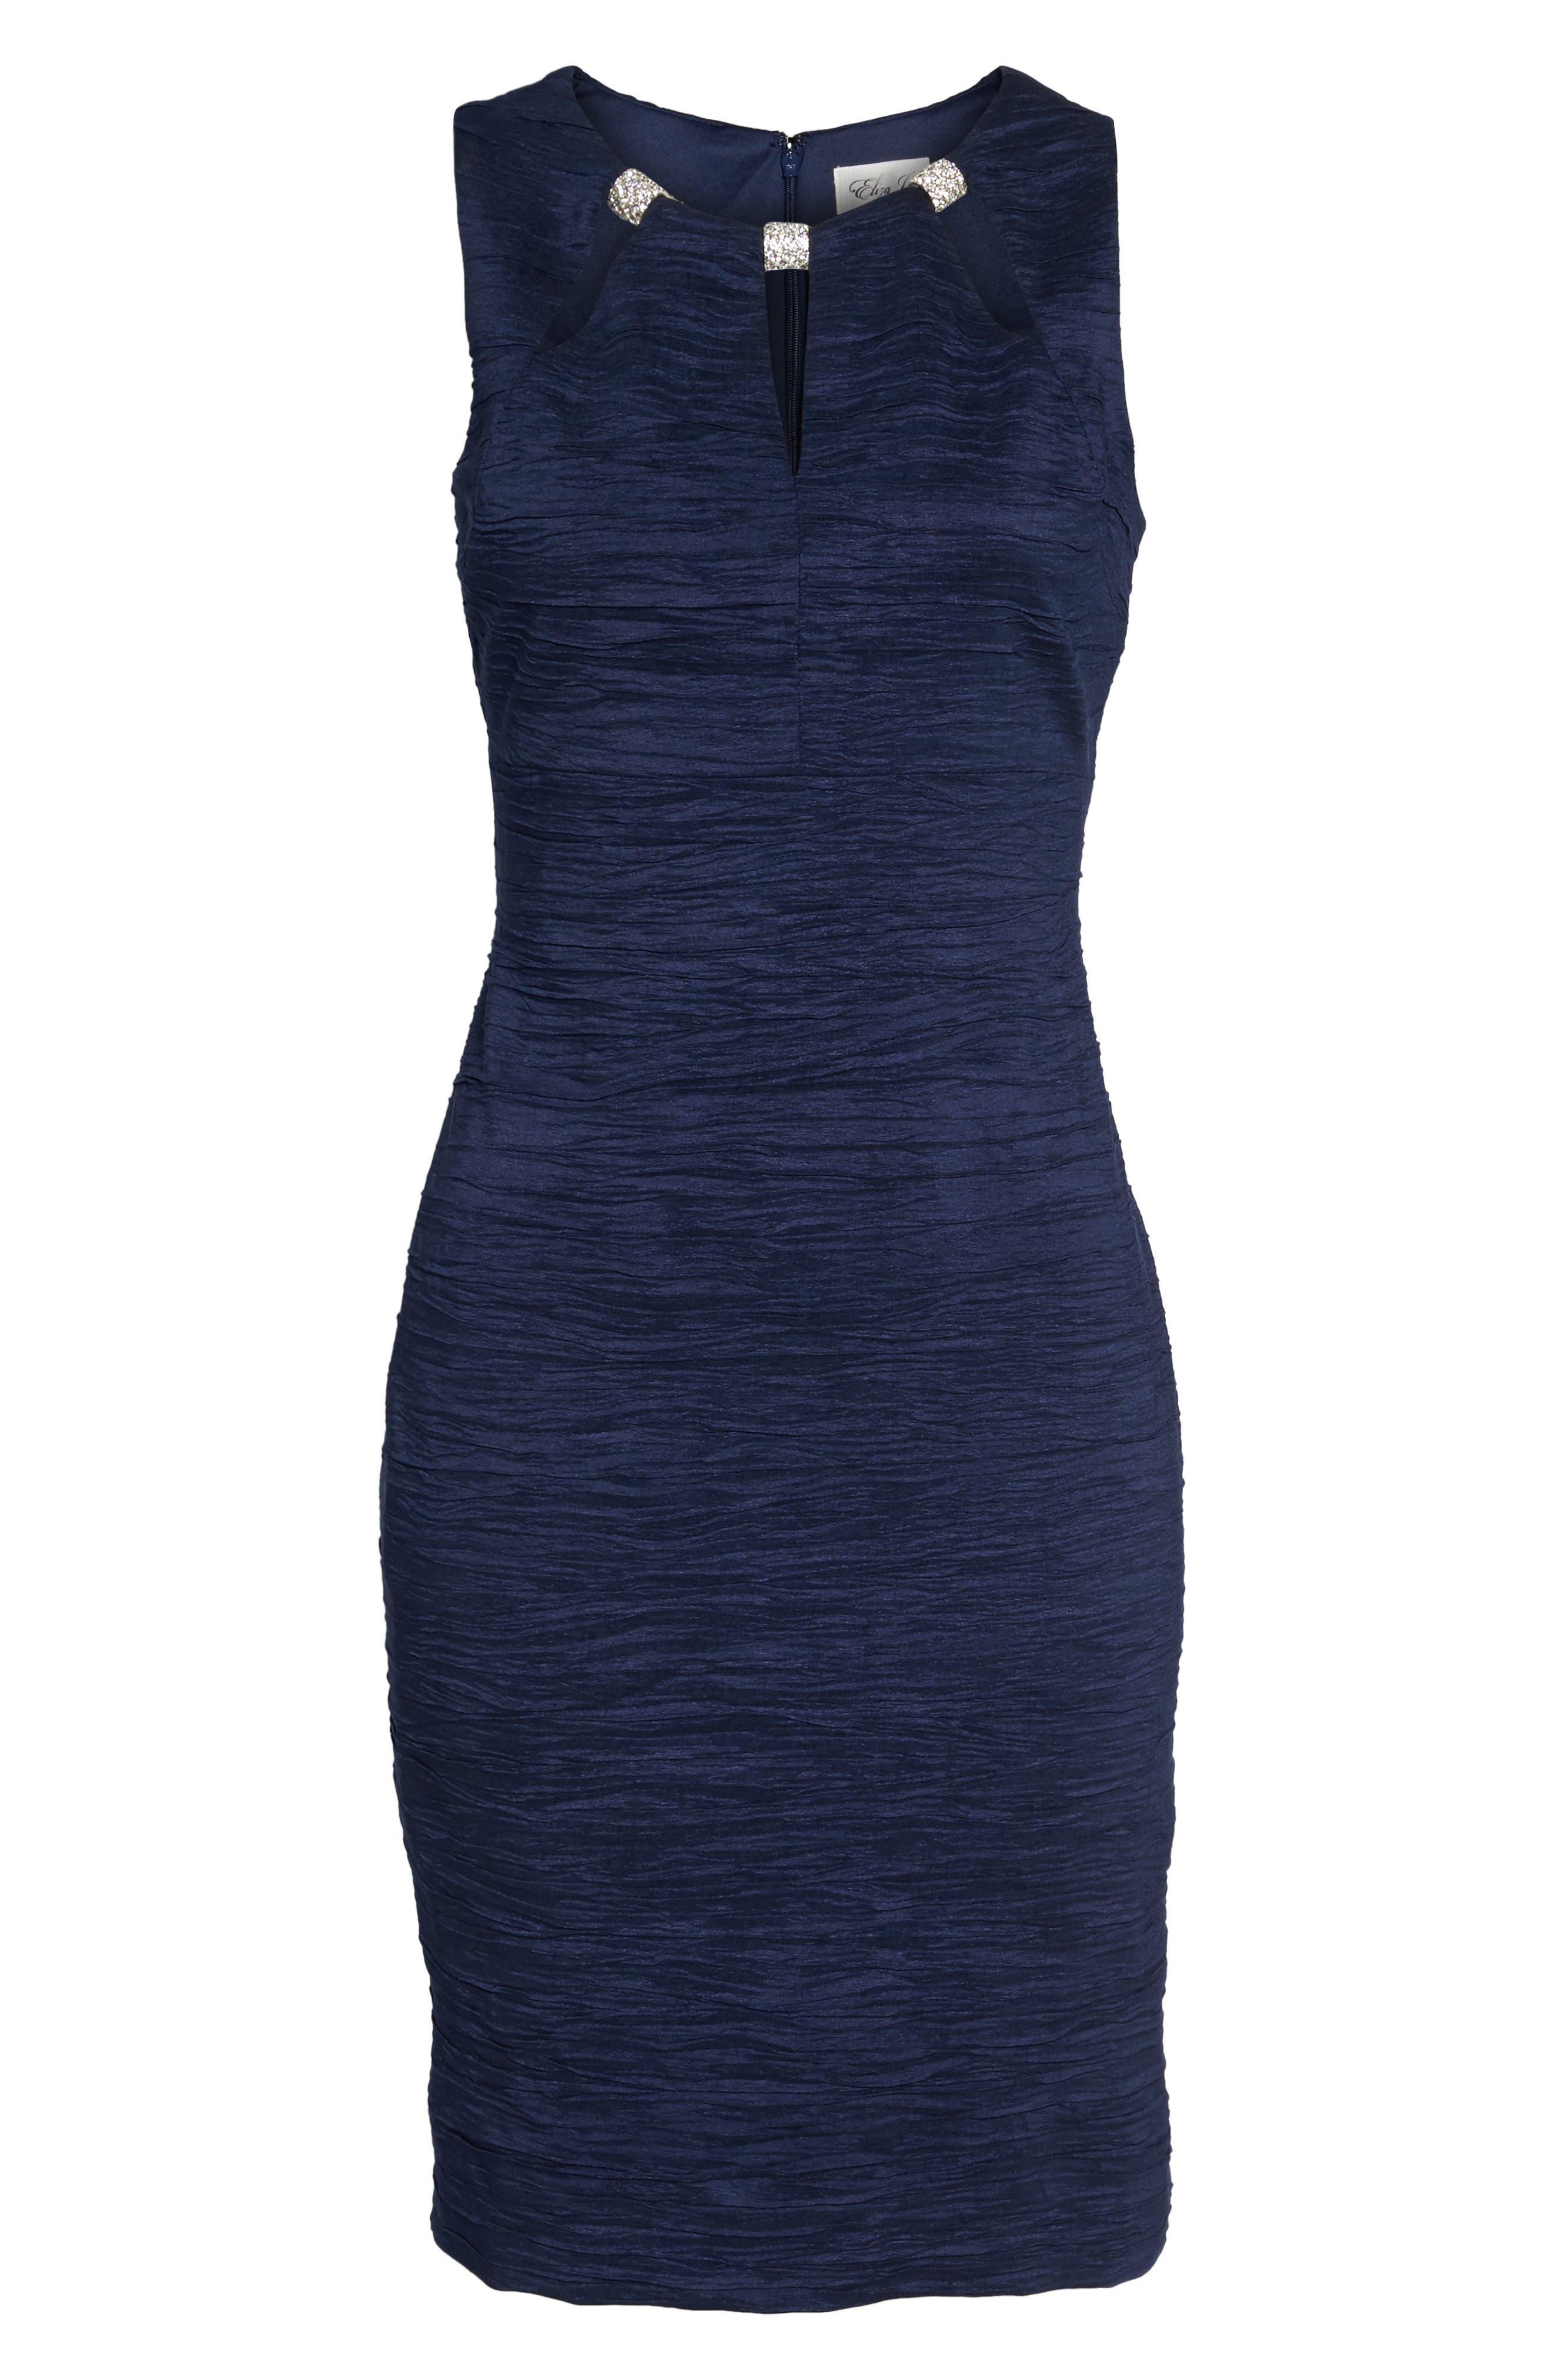 Embellished Cutout Taffeta Sheath Dress,                             Alternate thumbnail 7, color,                             410